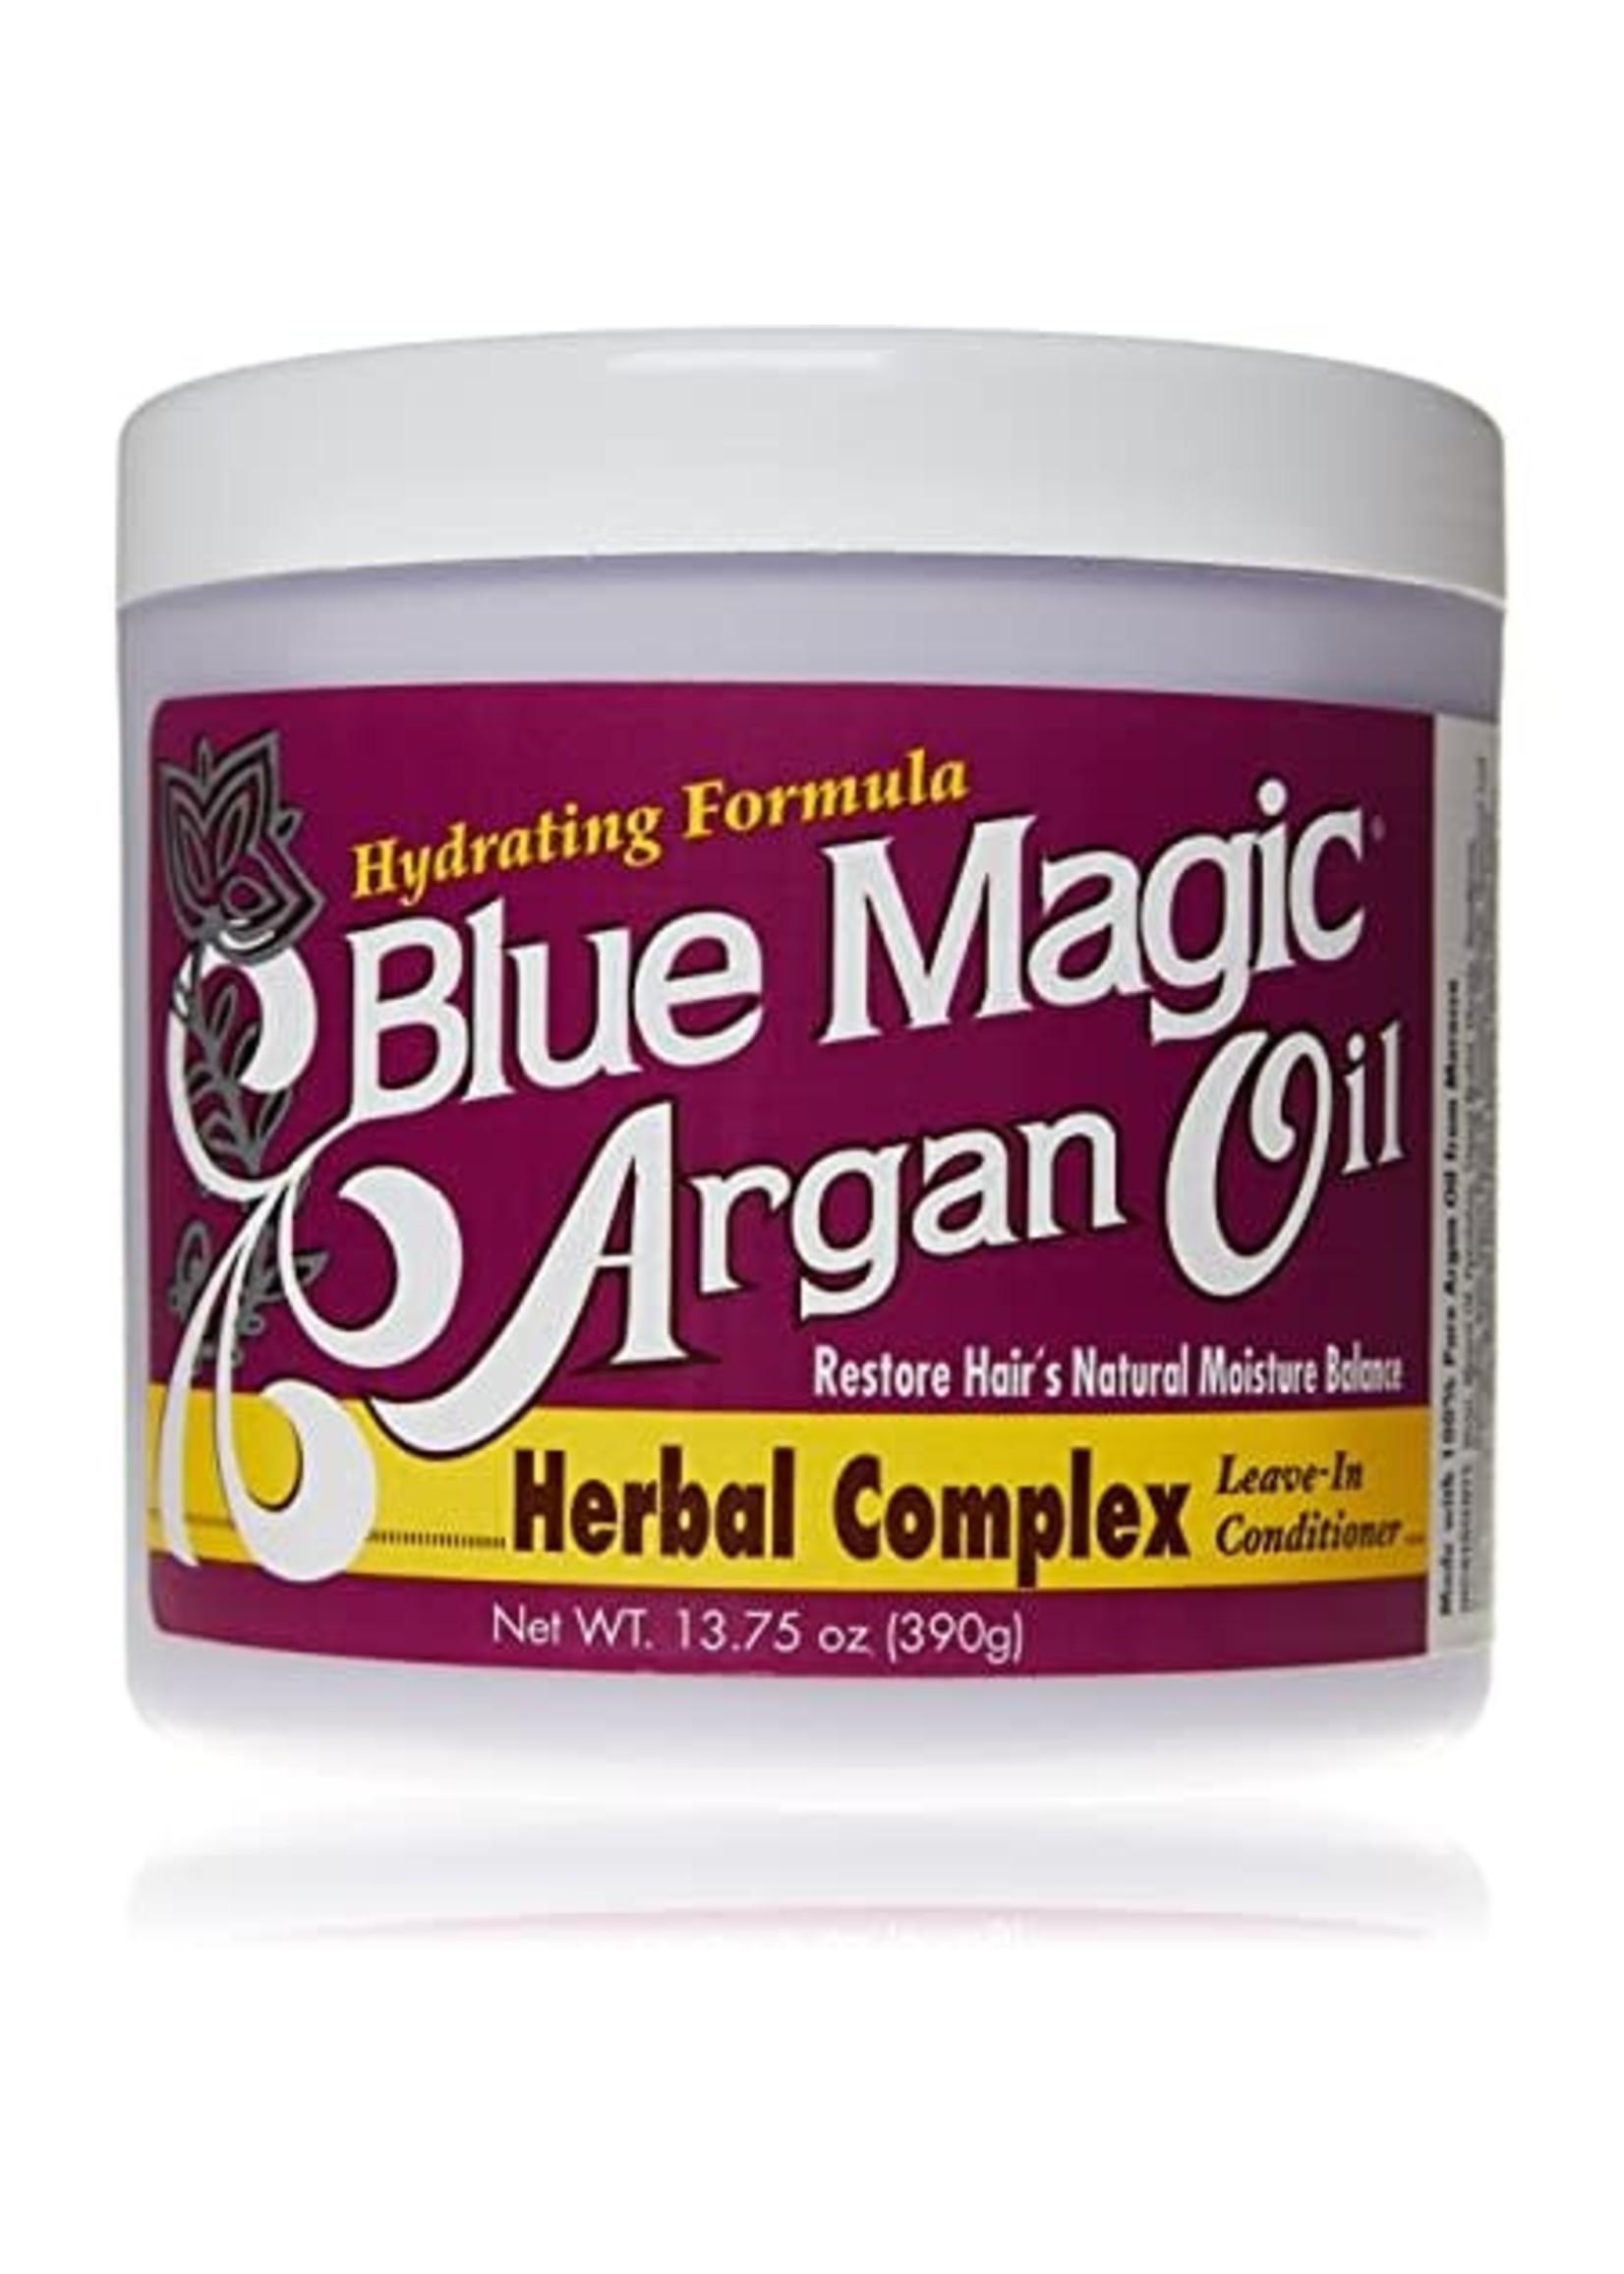 Blue Magic Argan Oil Herbal Complex